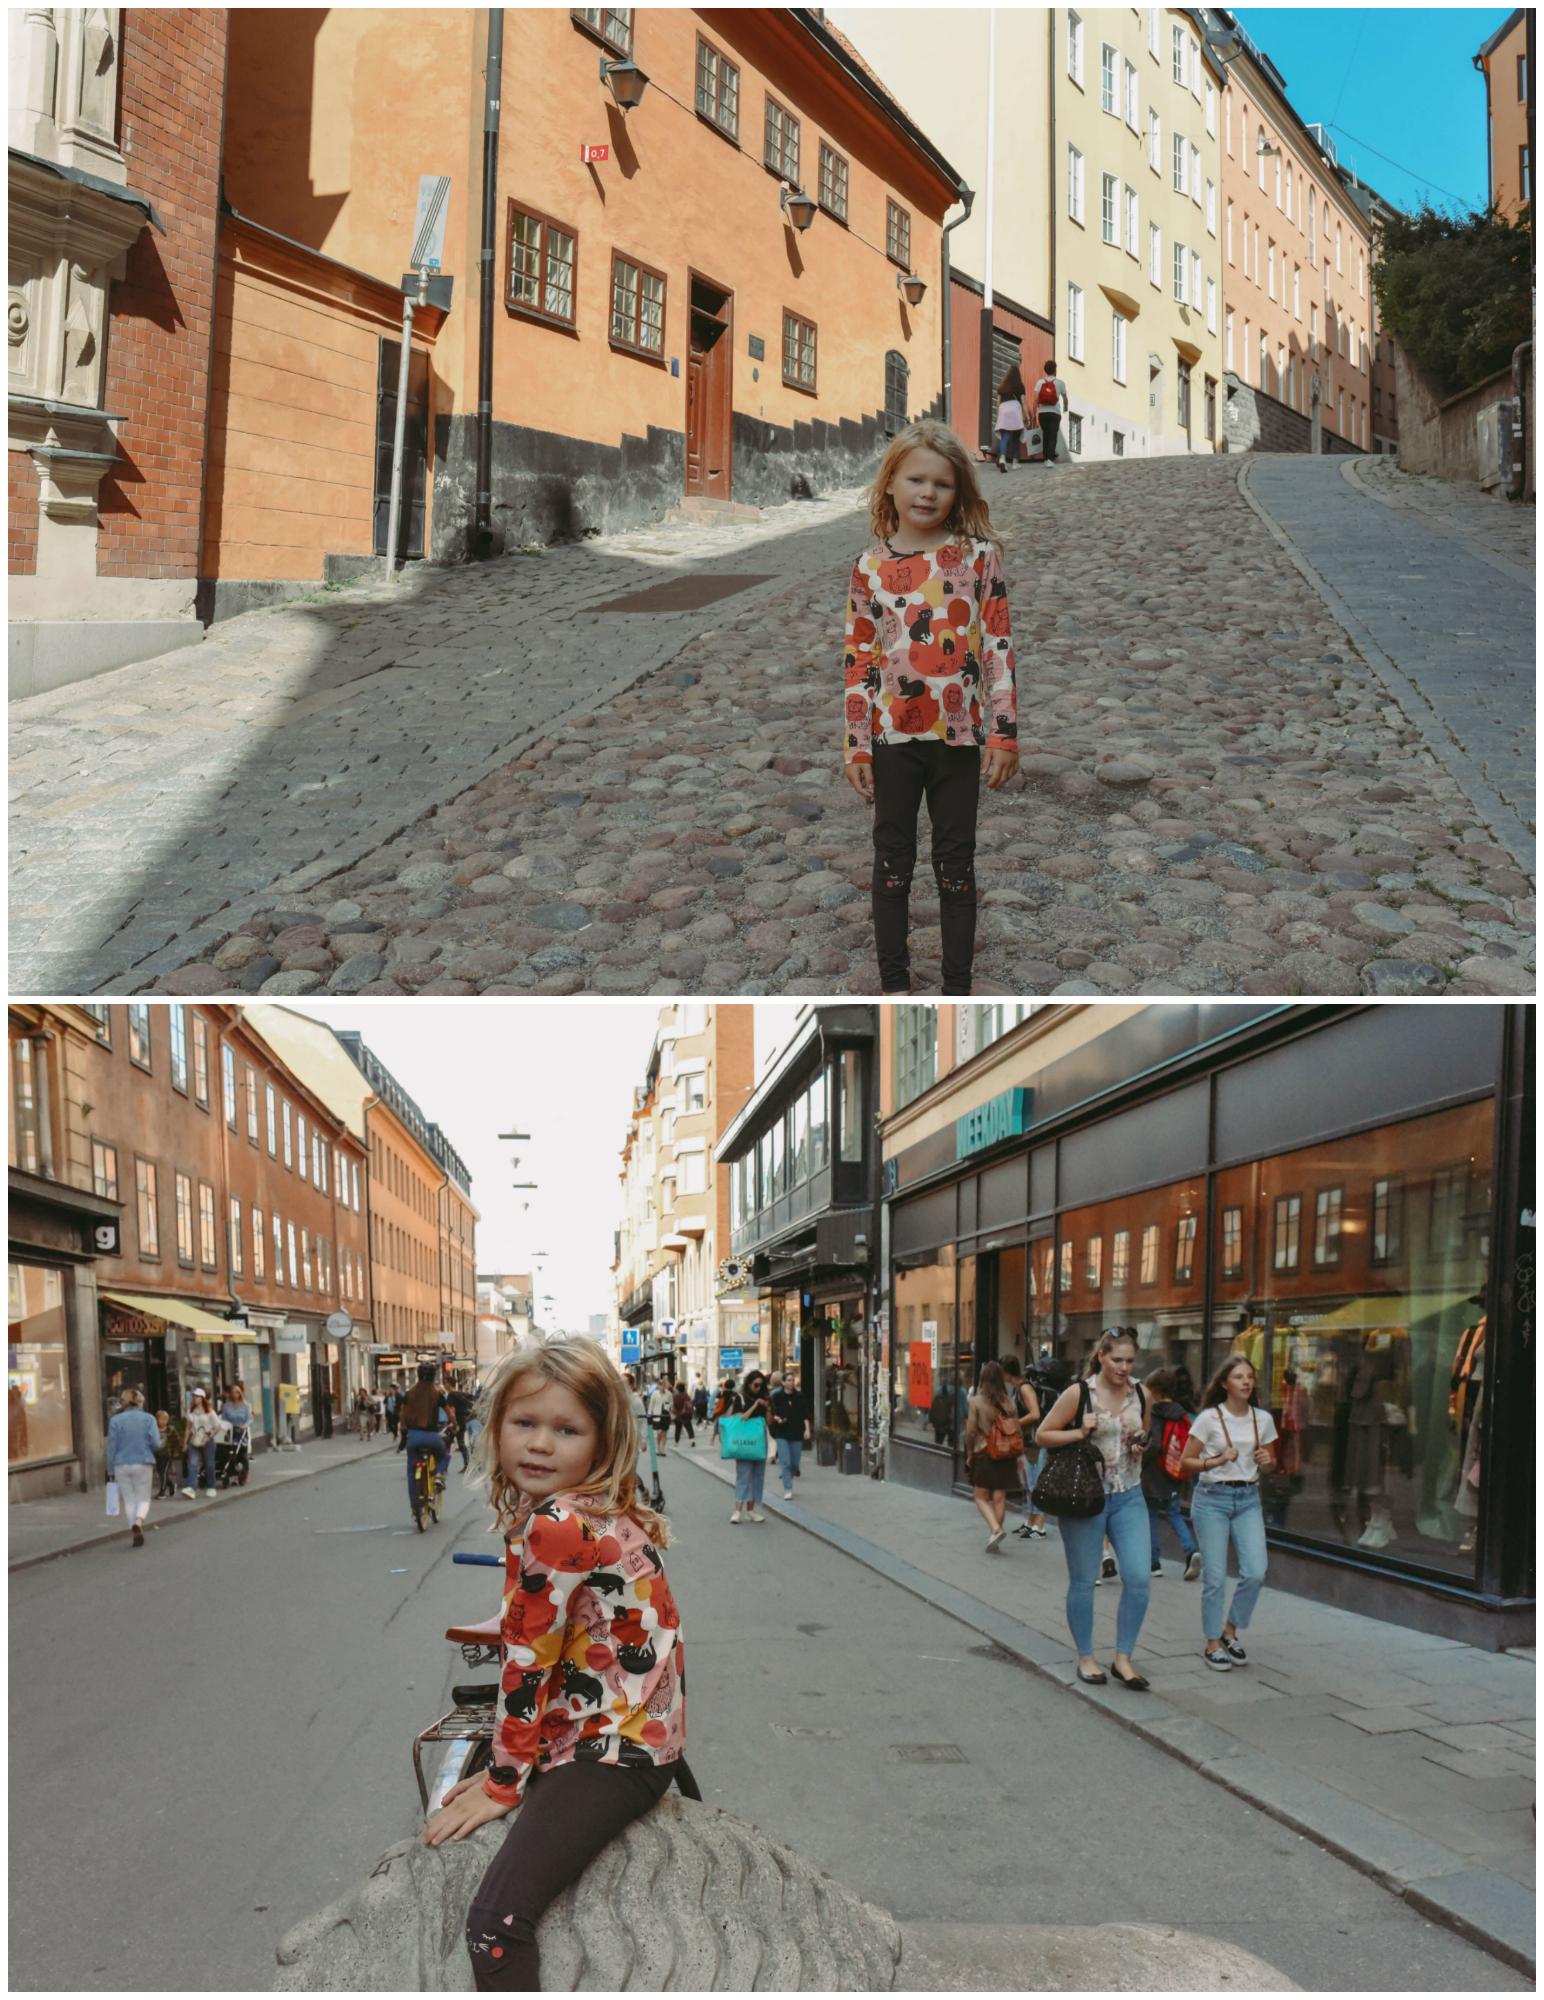 Götgatan street